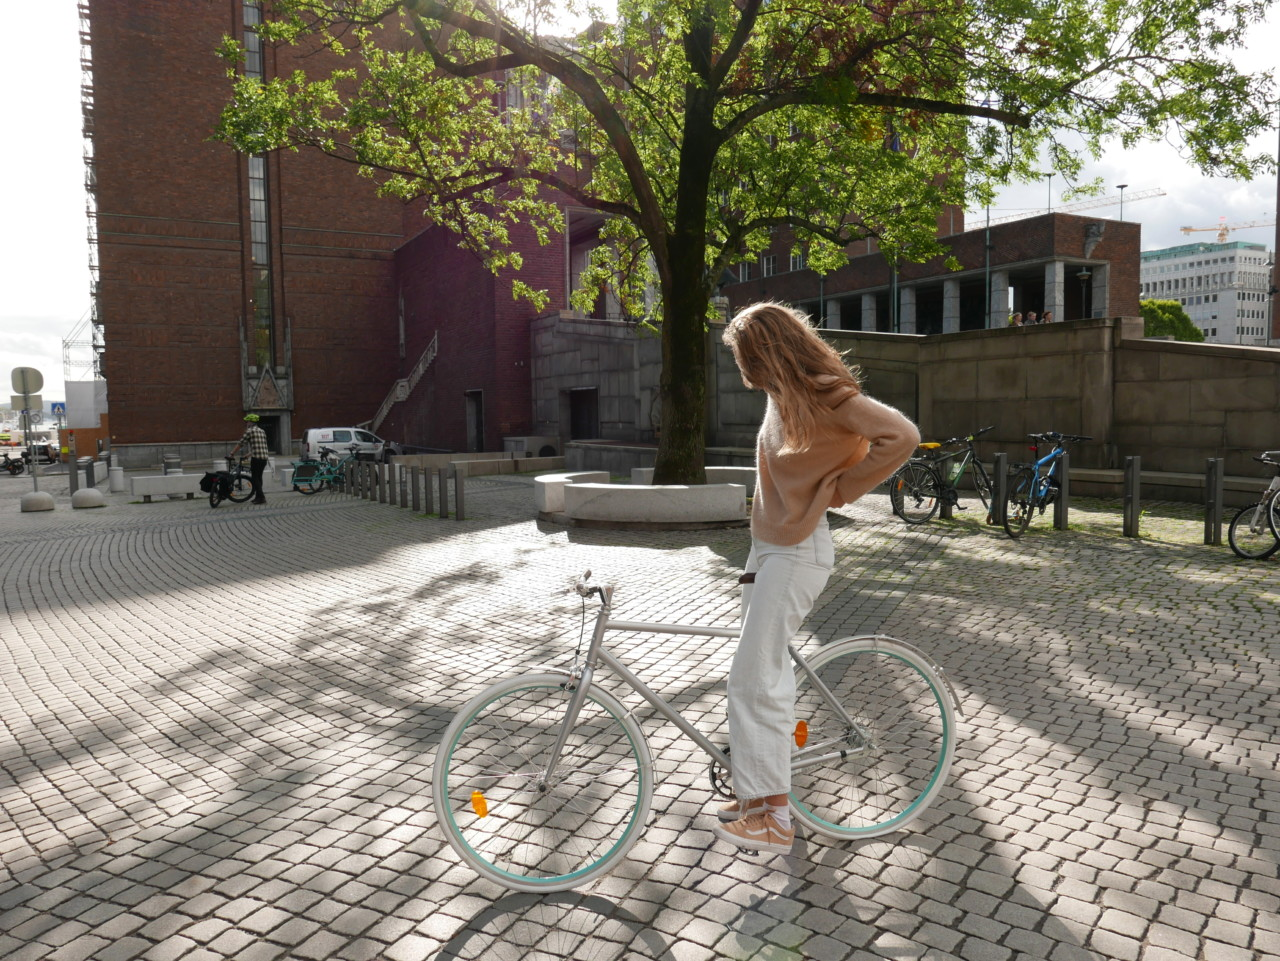 bysyklist-for-alltid-maria-huseby